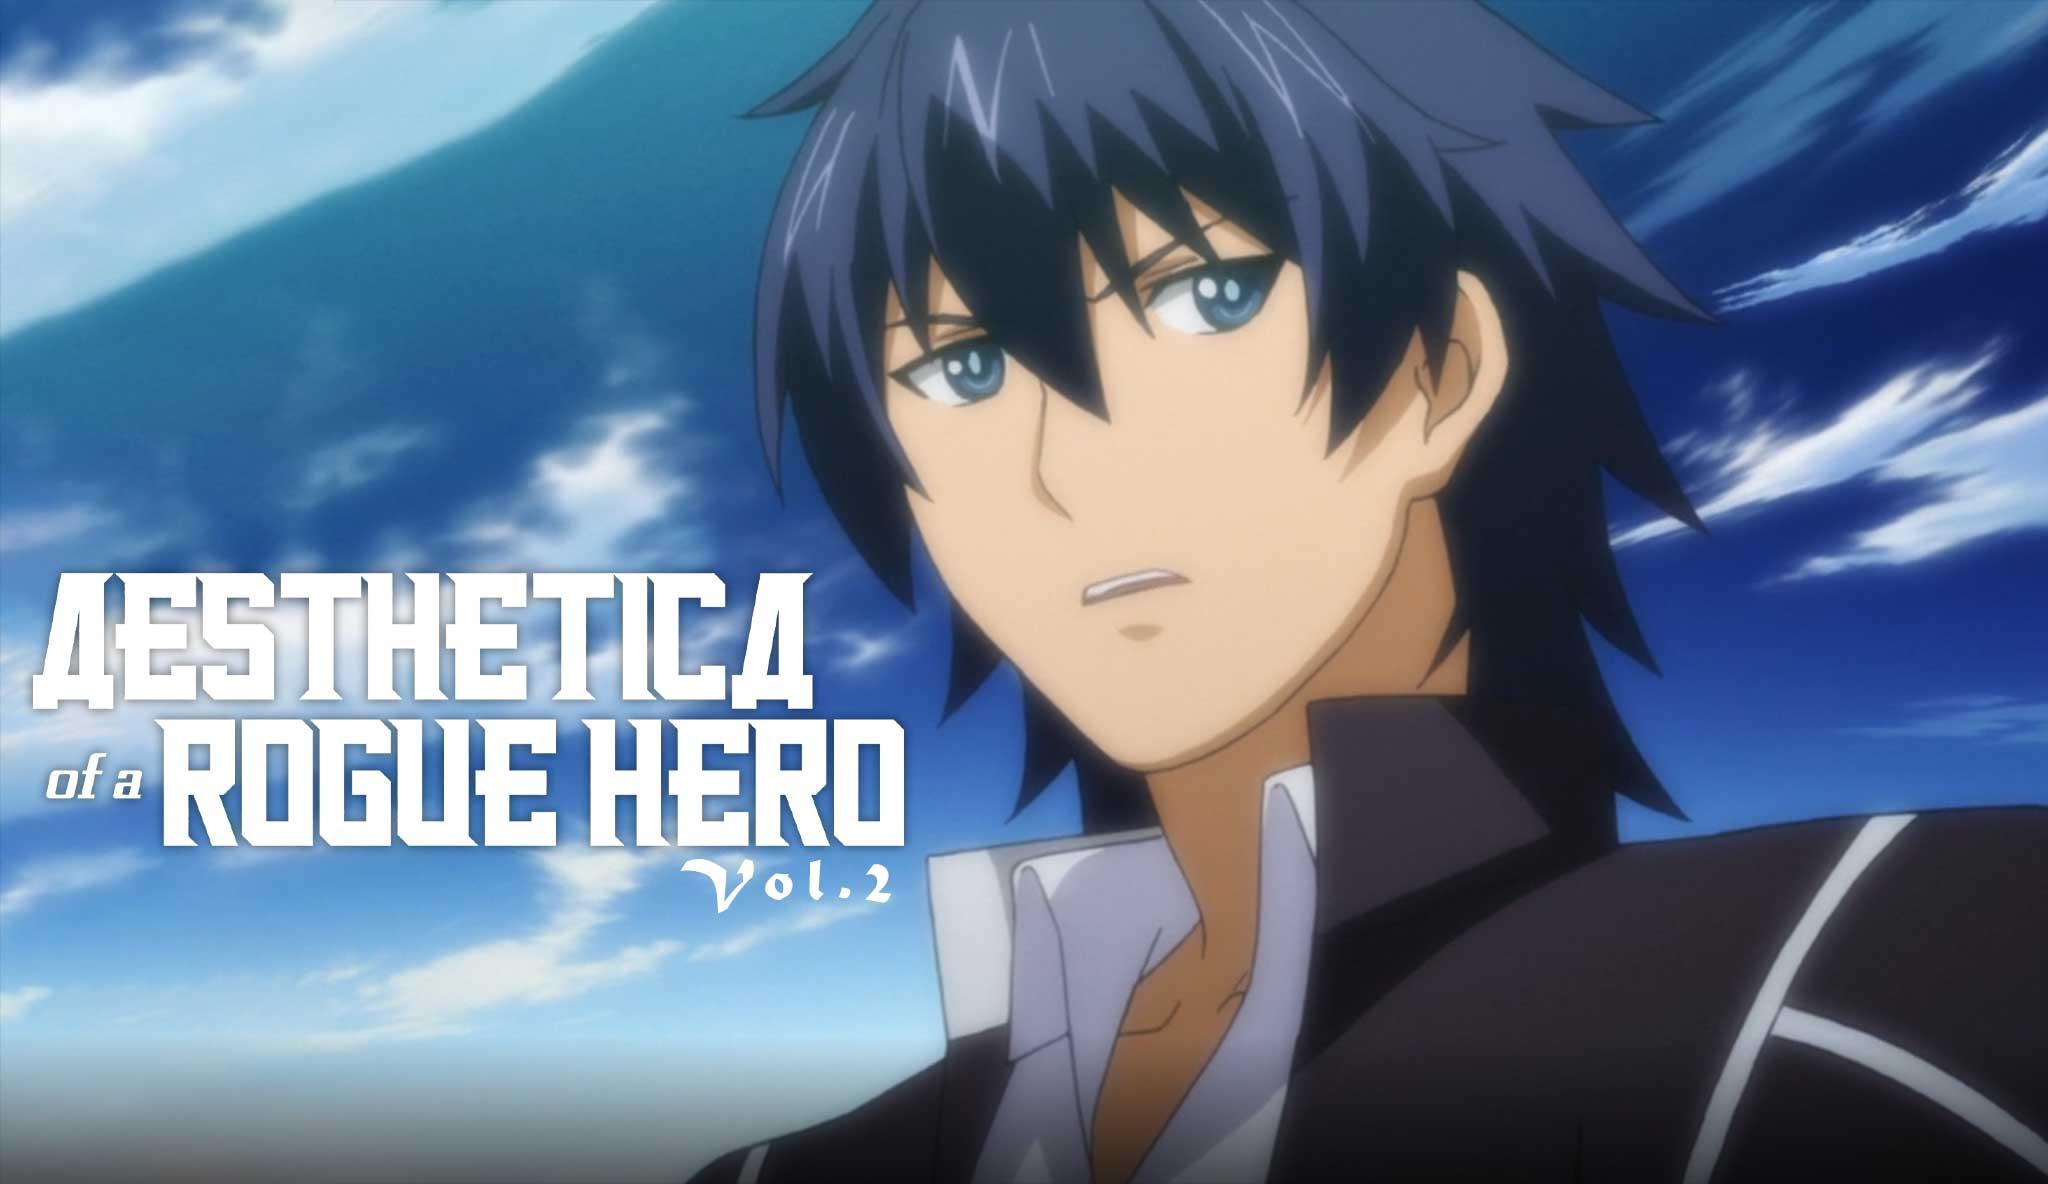 the-aesthetica-of-a-rogue-hero-vol-2-episode-5-8\header.jpg